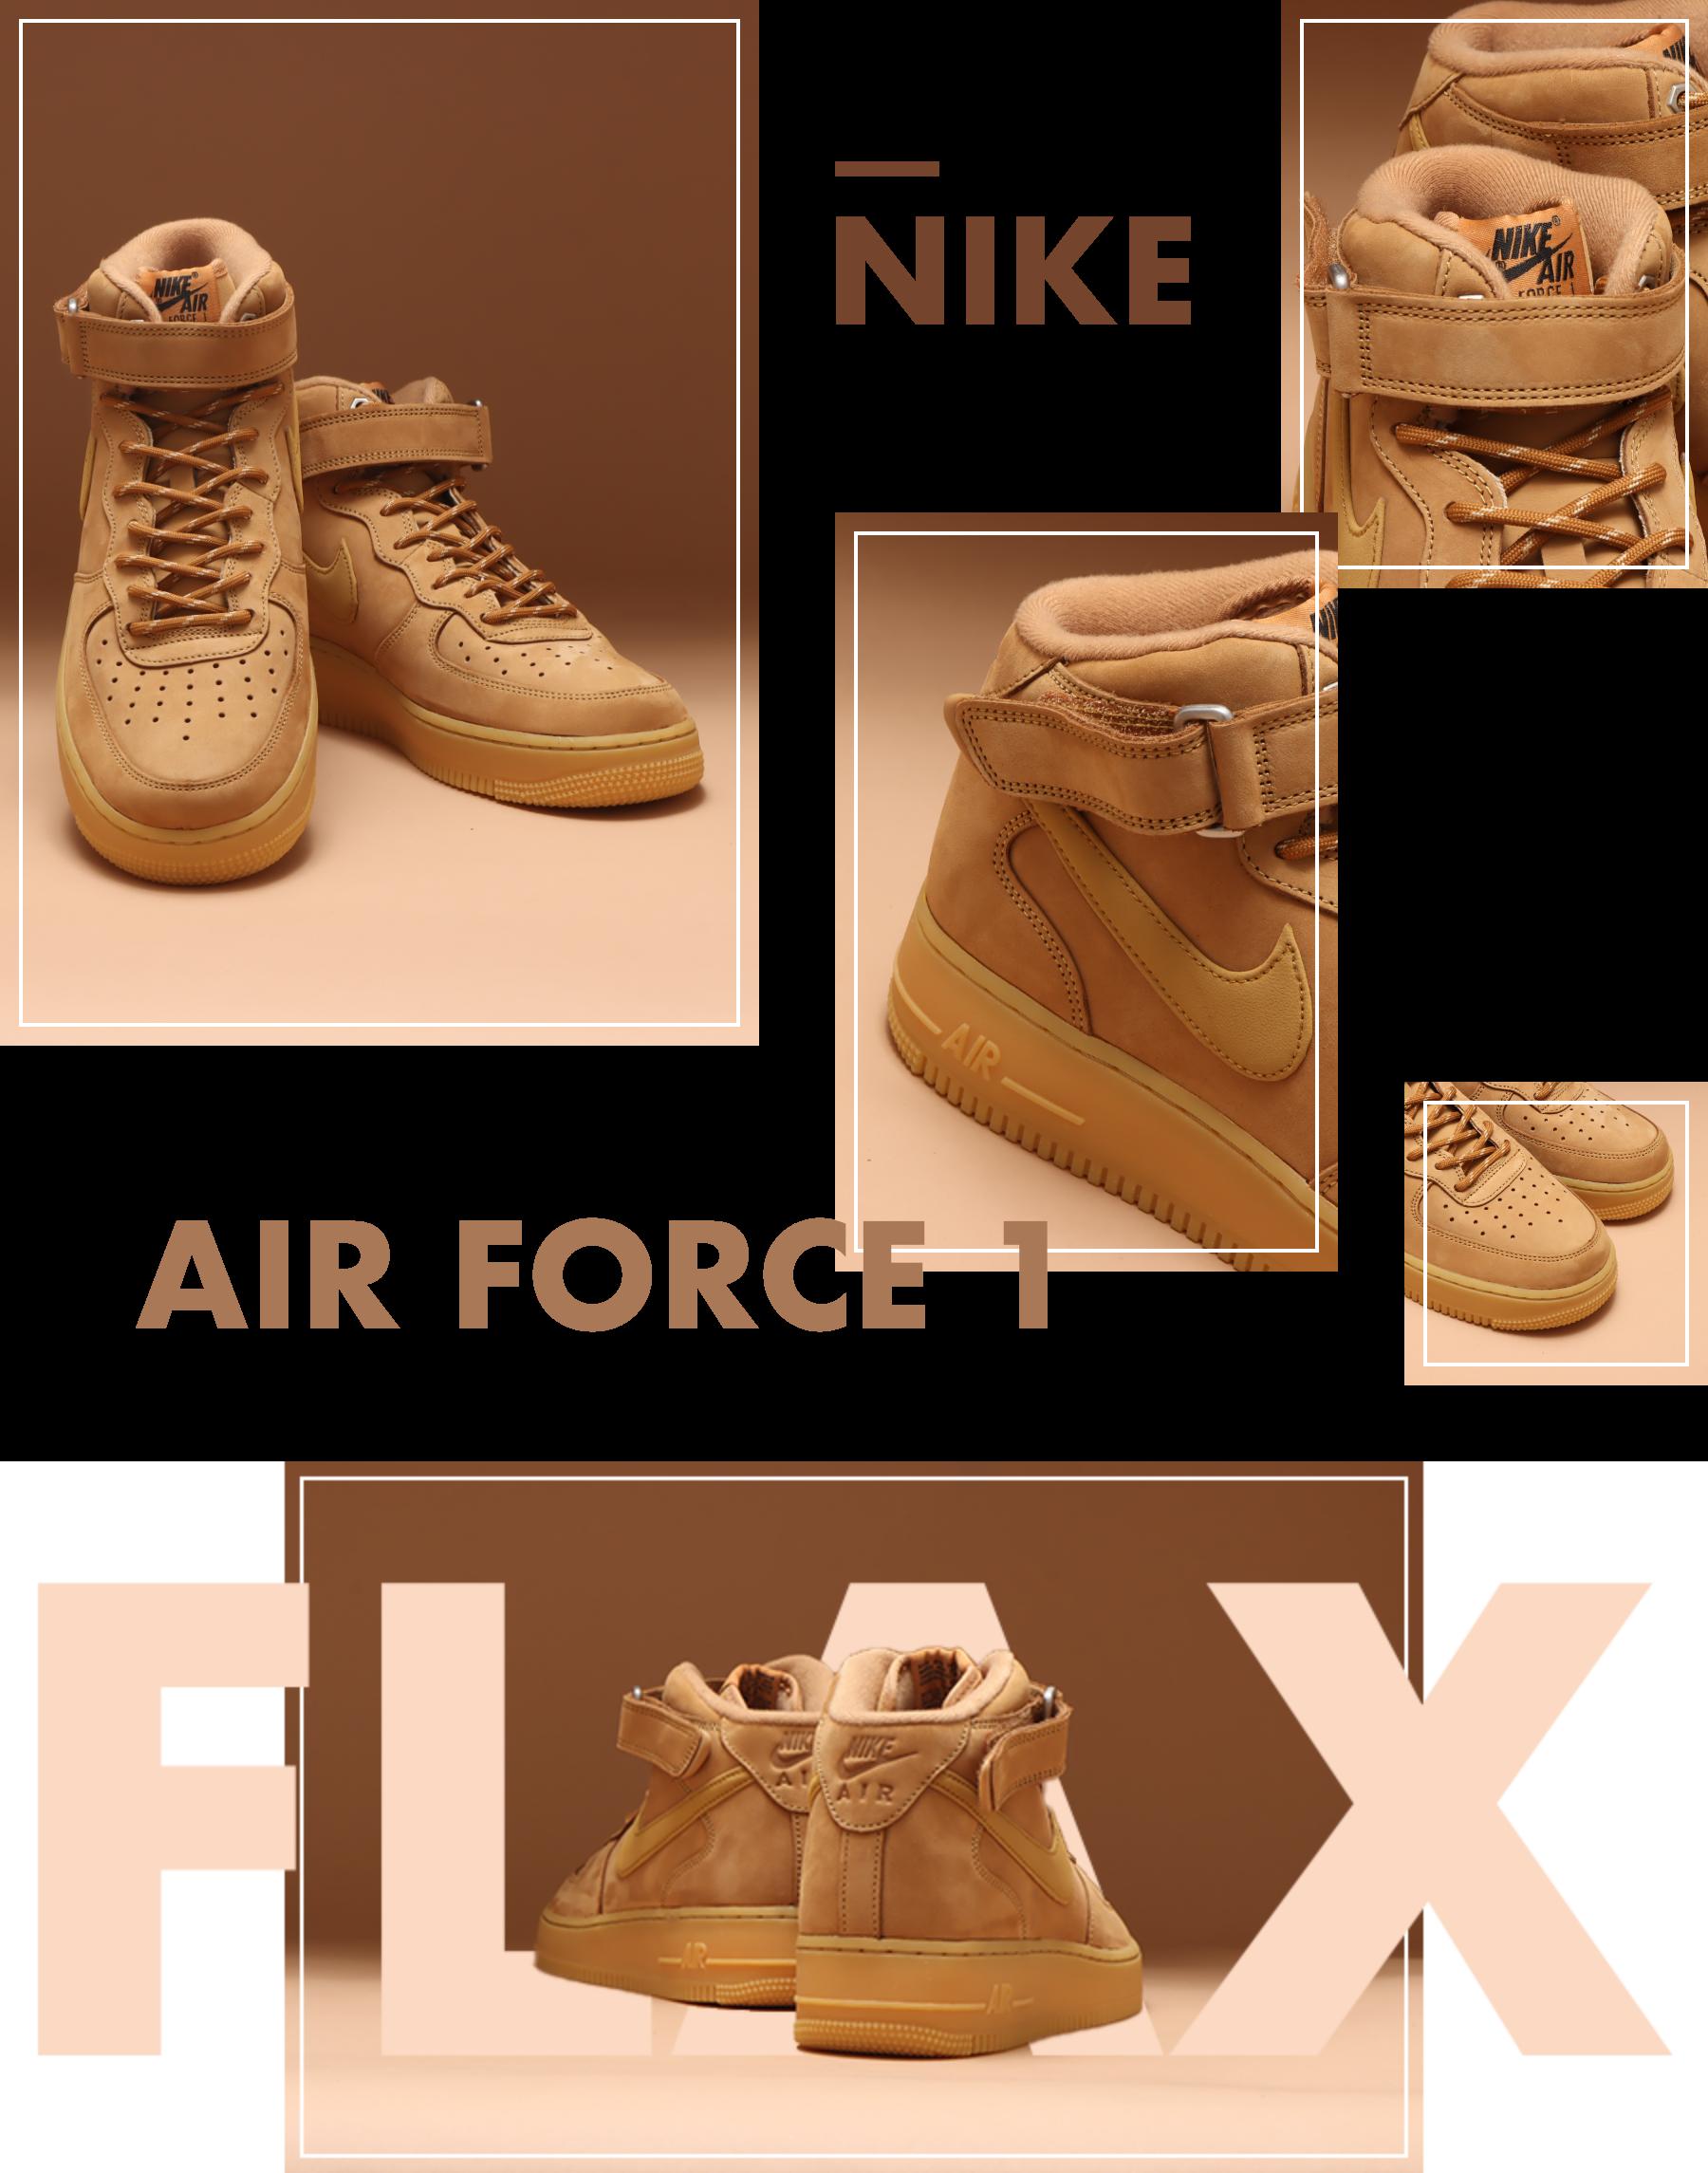 NIKE AIR FORCE 1 MID '07 FLAX